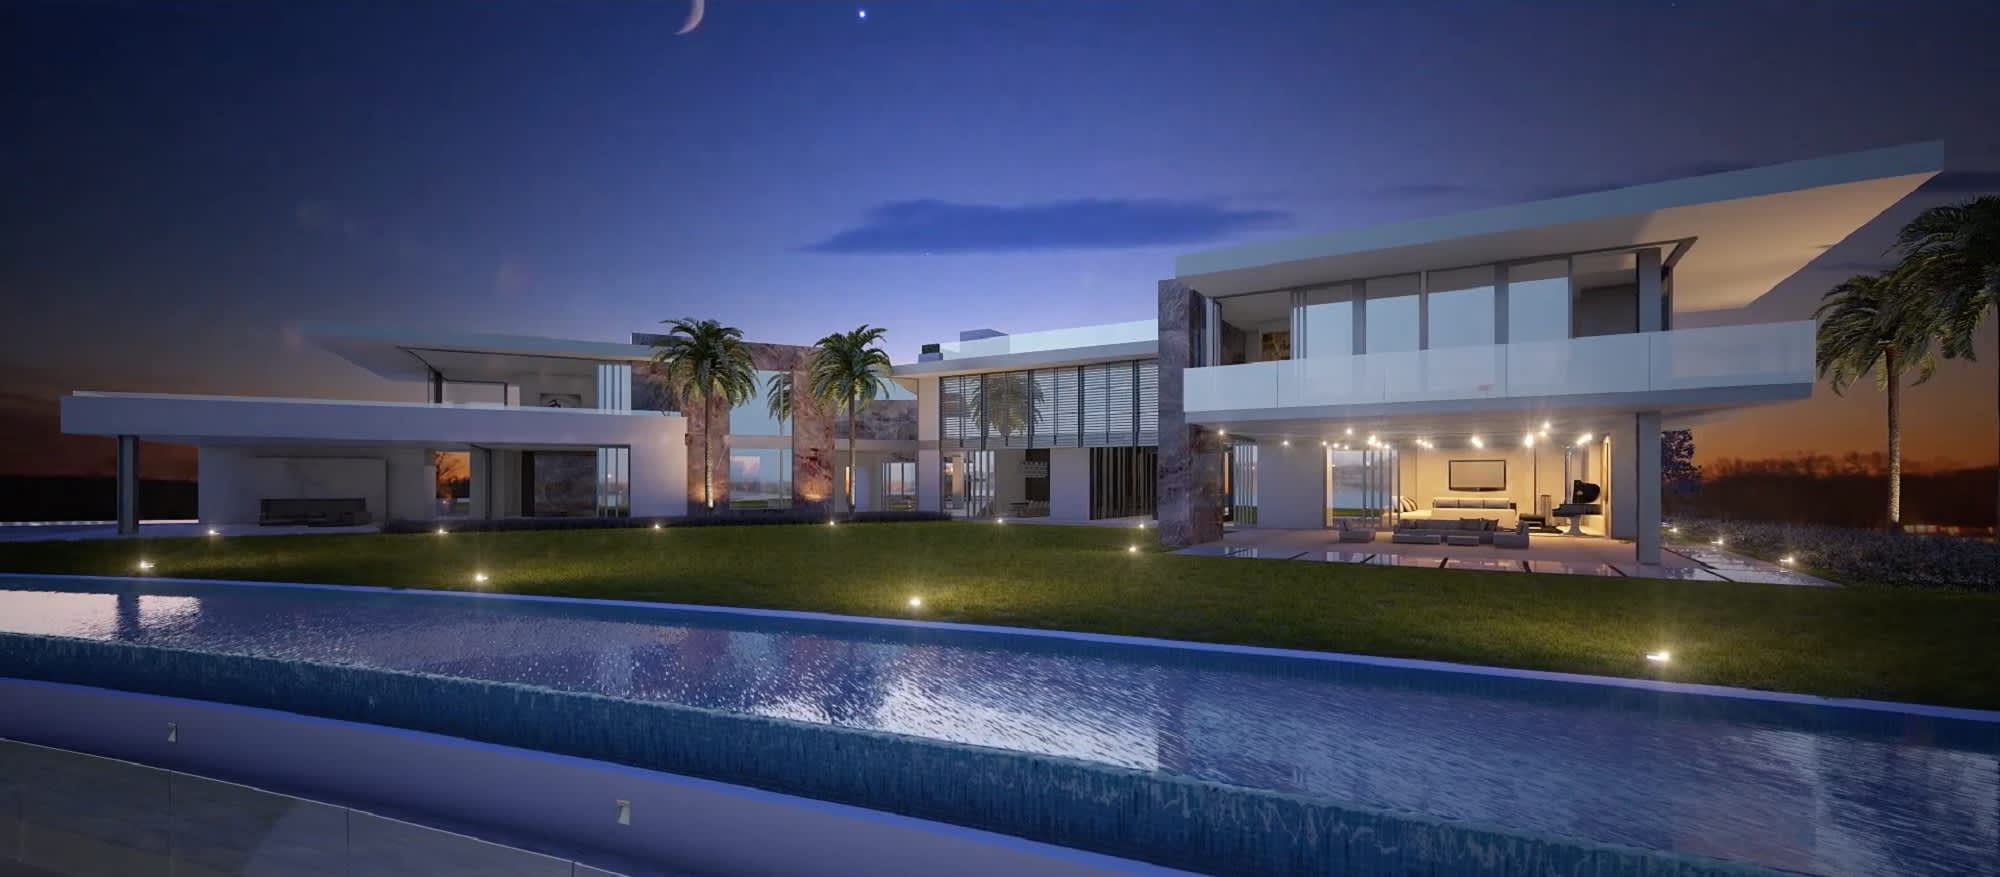 100 billion dollar house images for Pool designs under 50 000